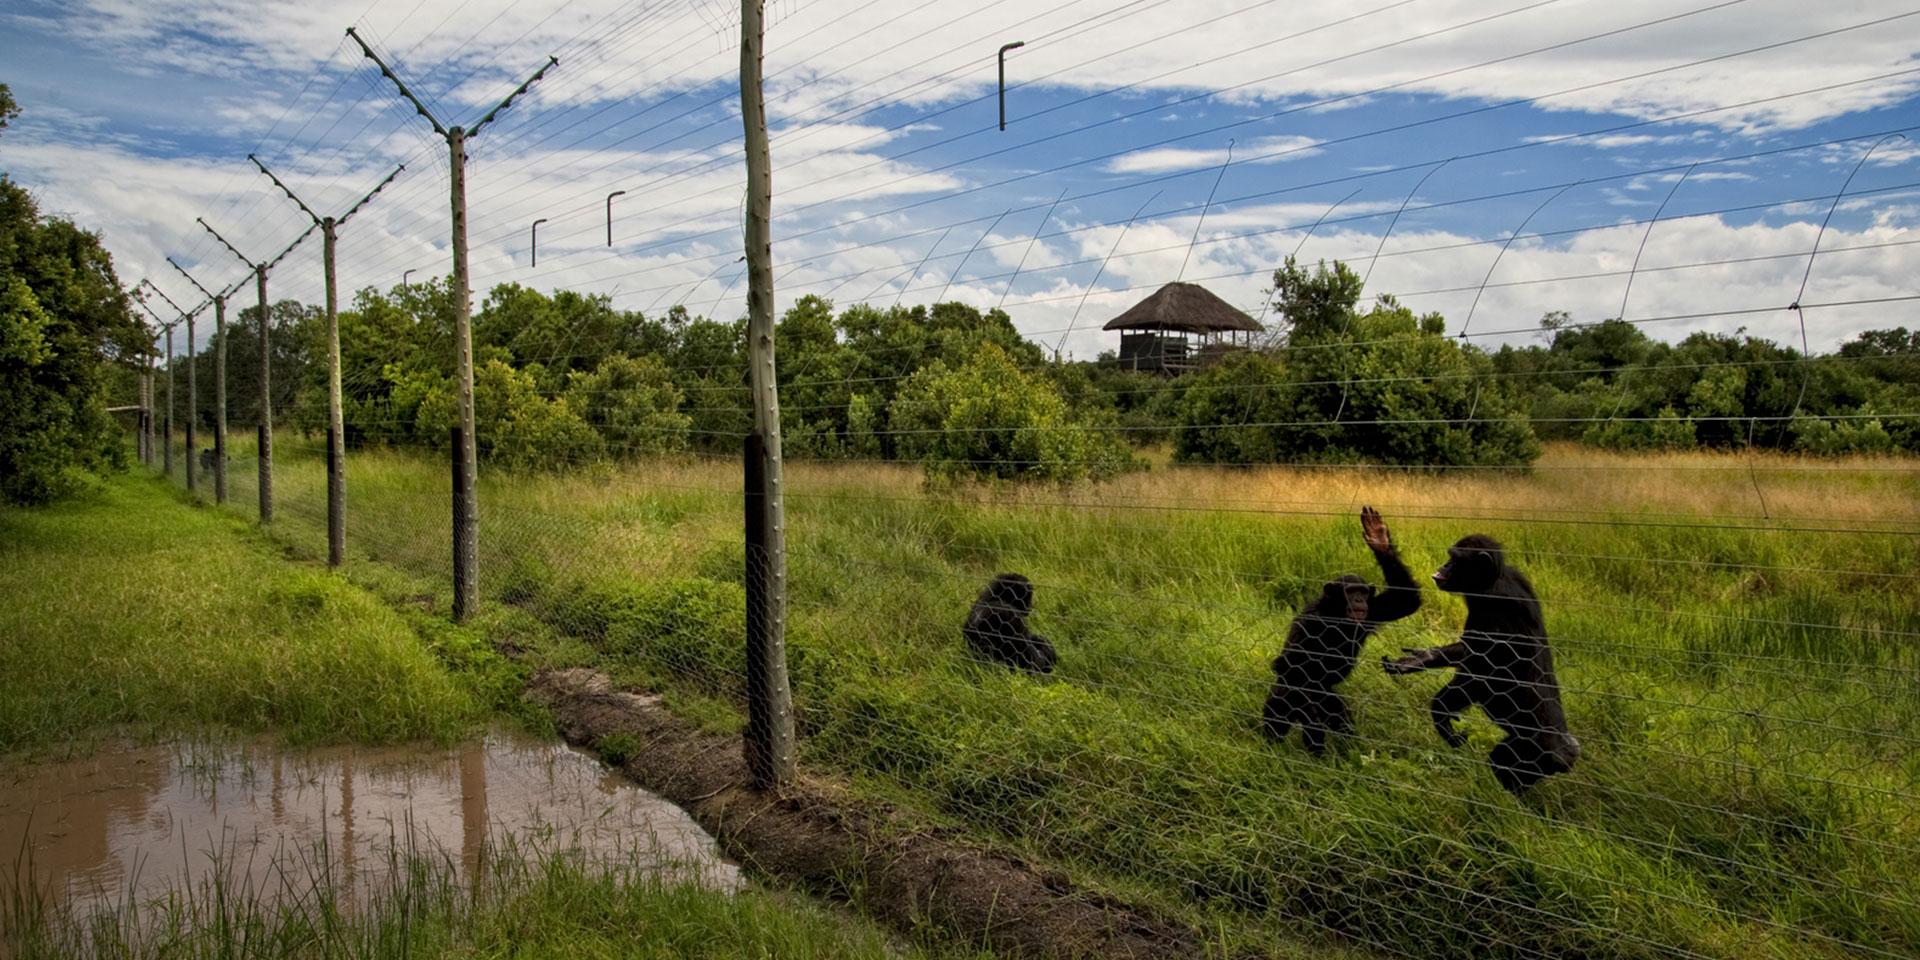 Ol Pejeta Chimpanzee Sanctuary